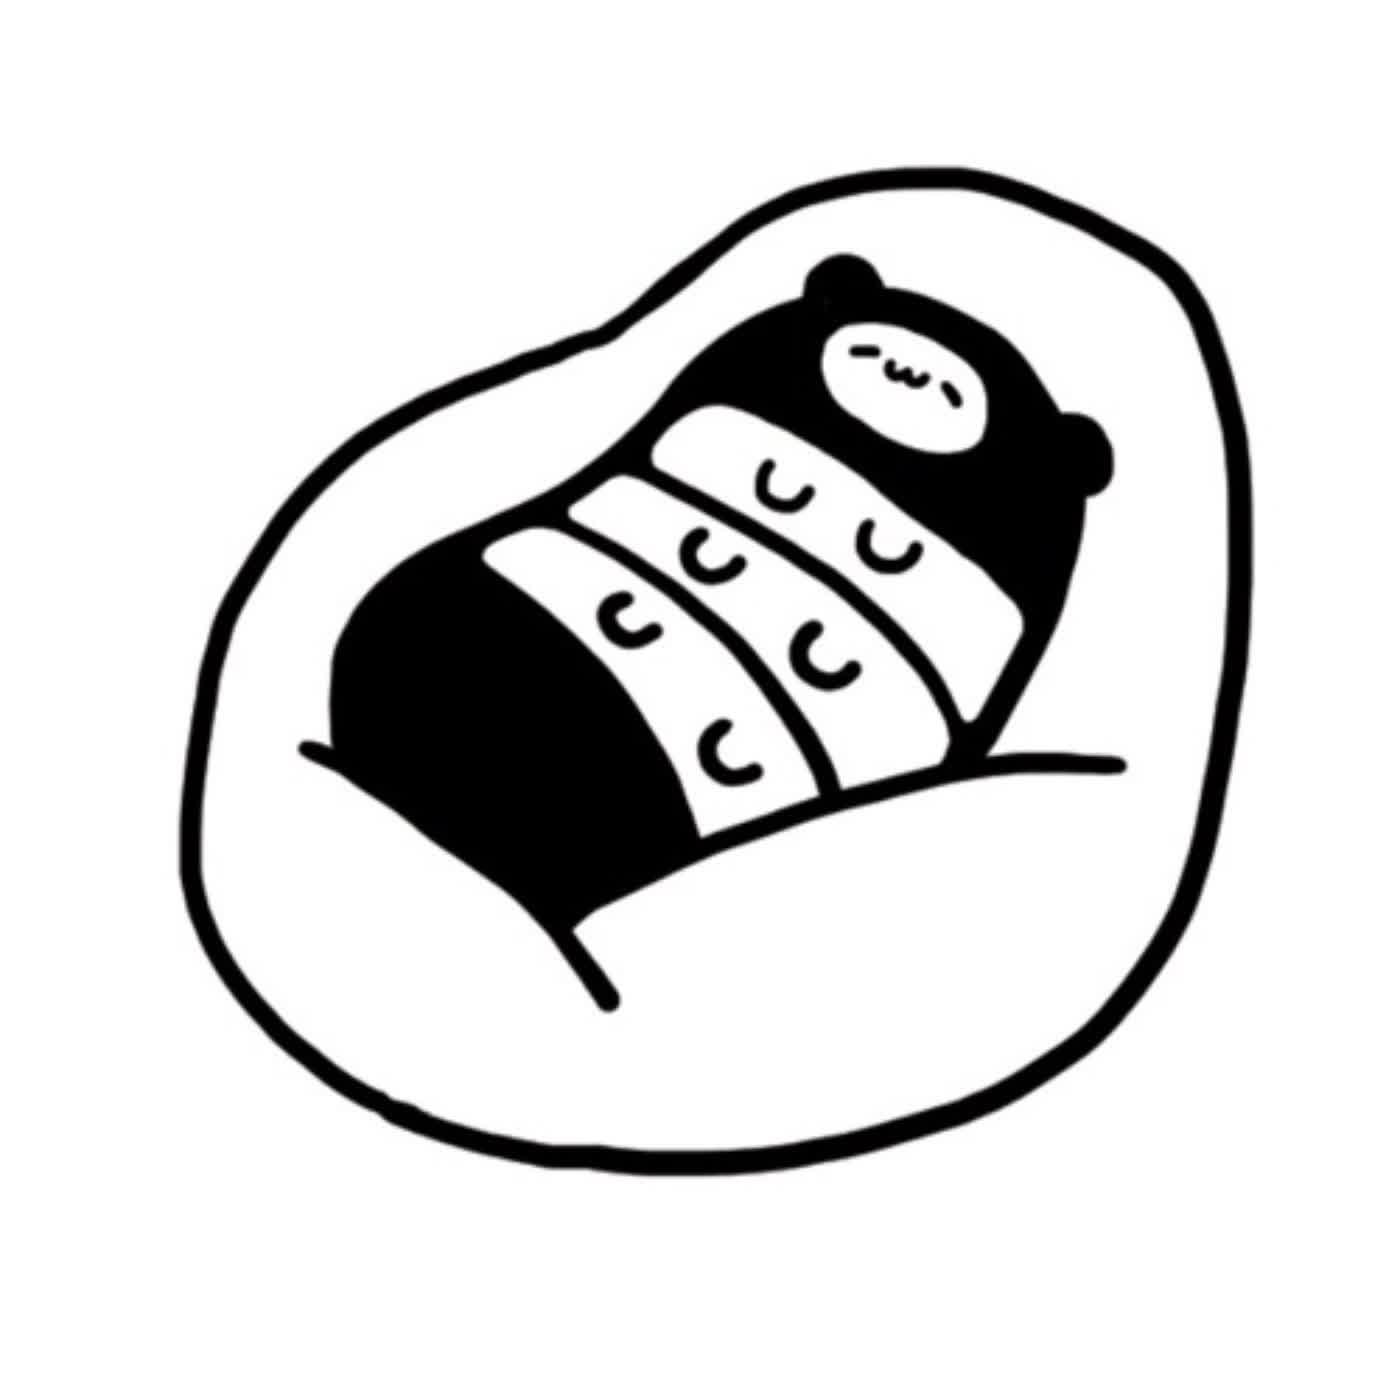 (EP3)琥珀鼠婦150元很貴,iphone12 128g 28500其實很便宜?